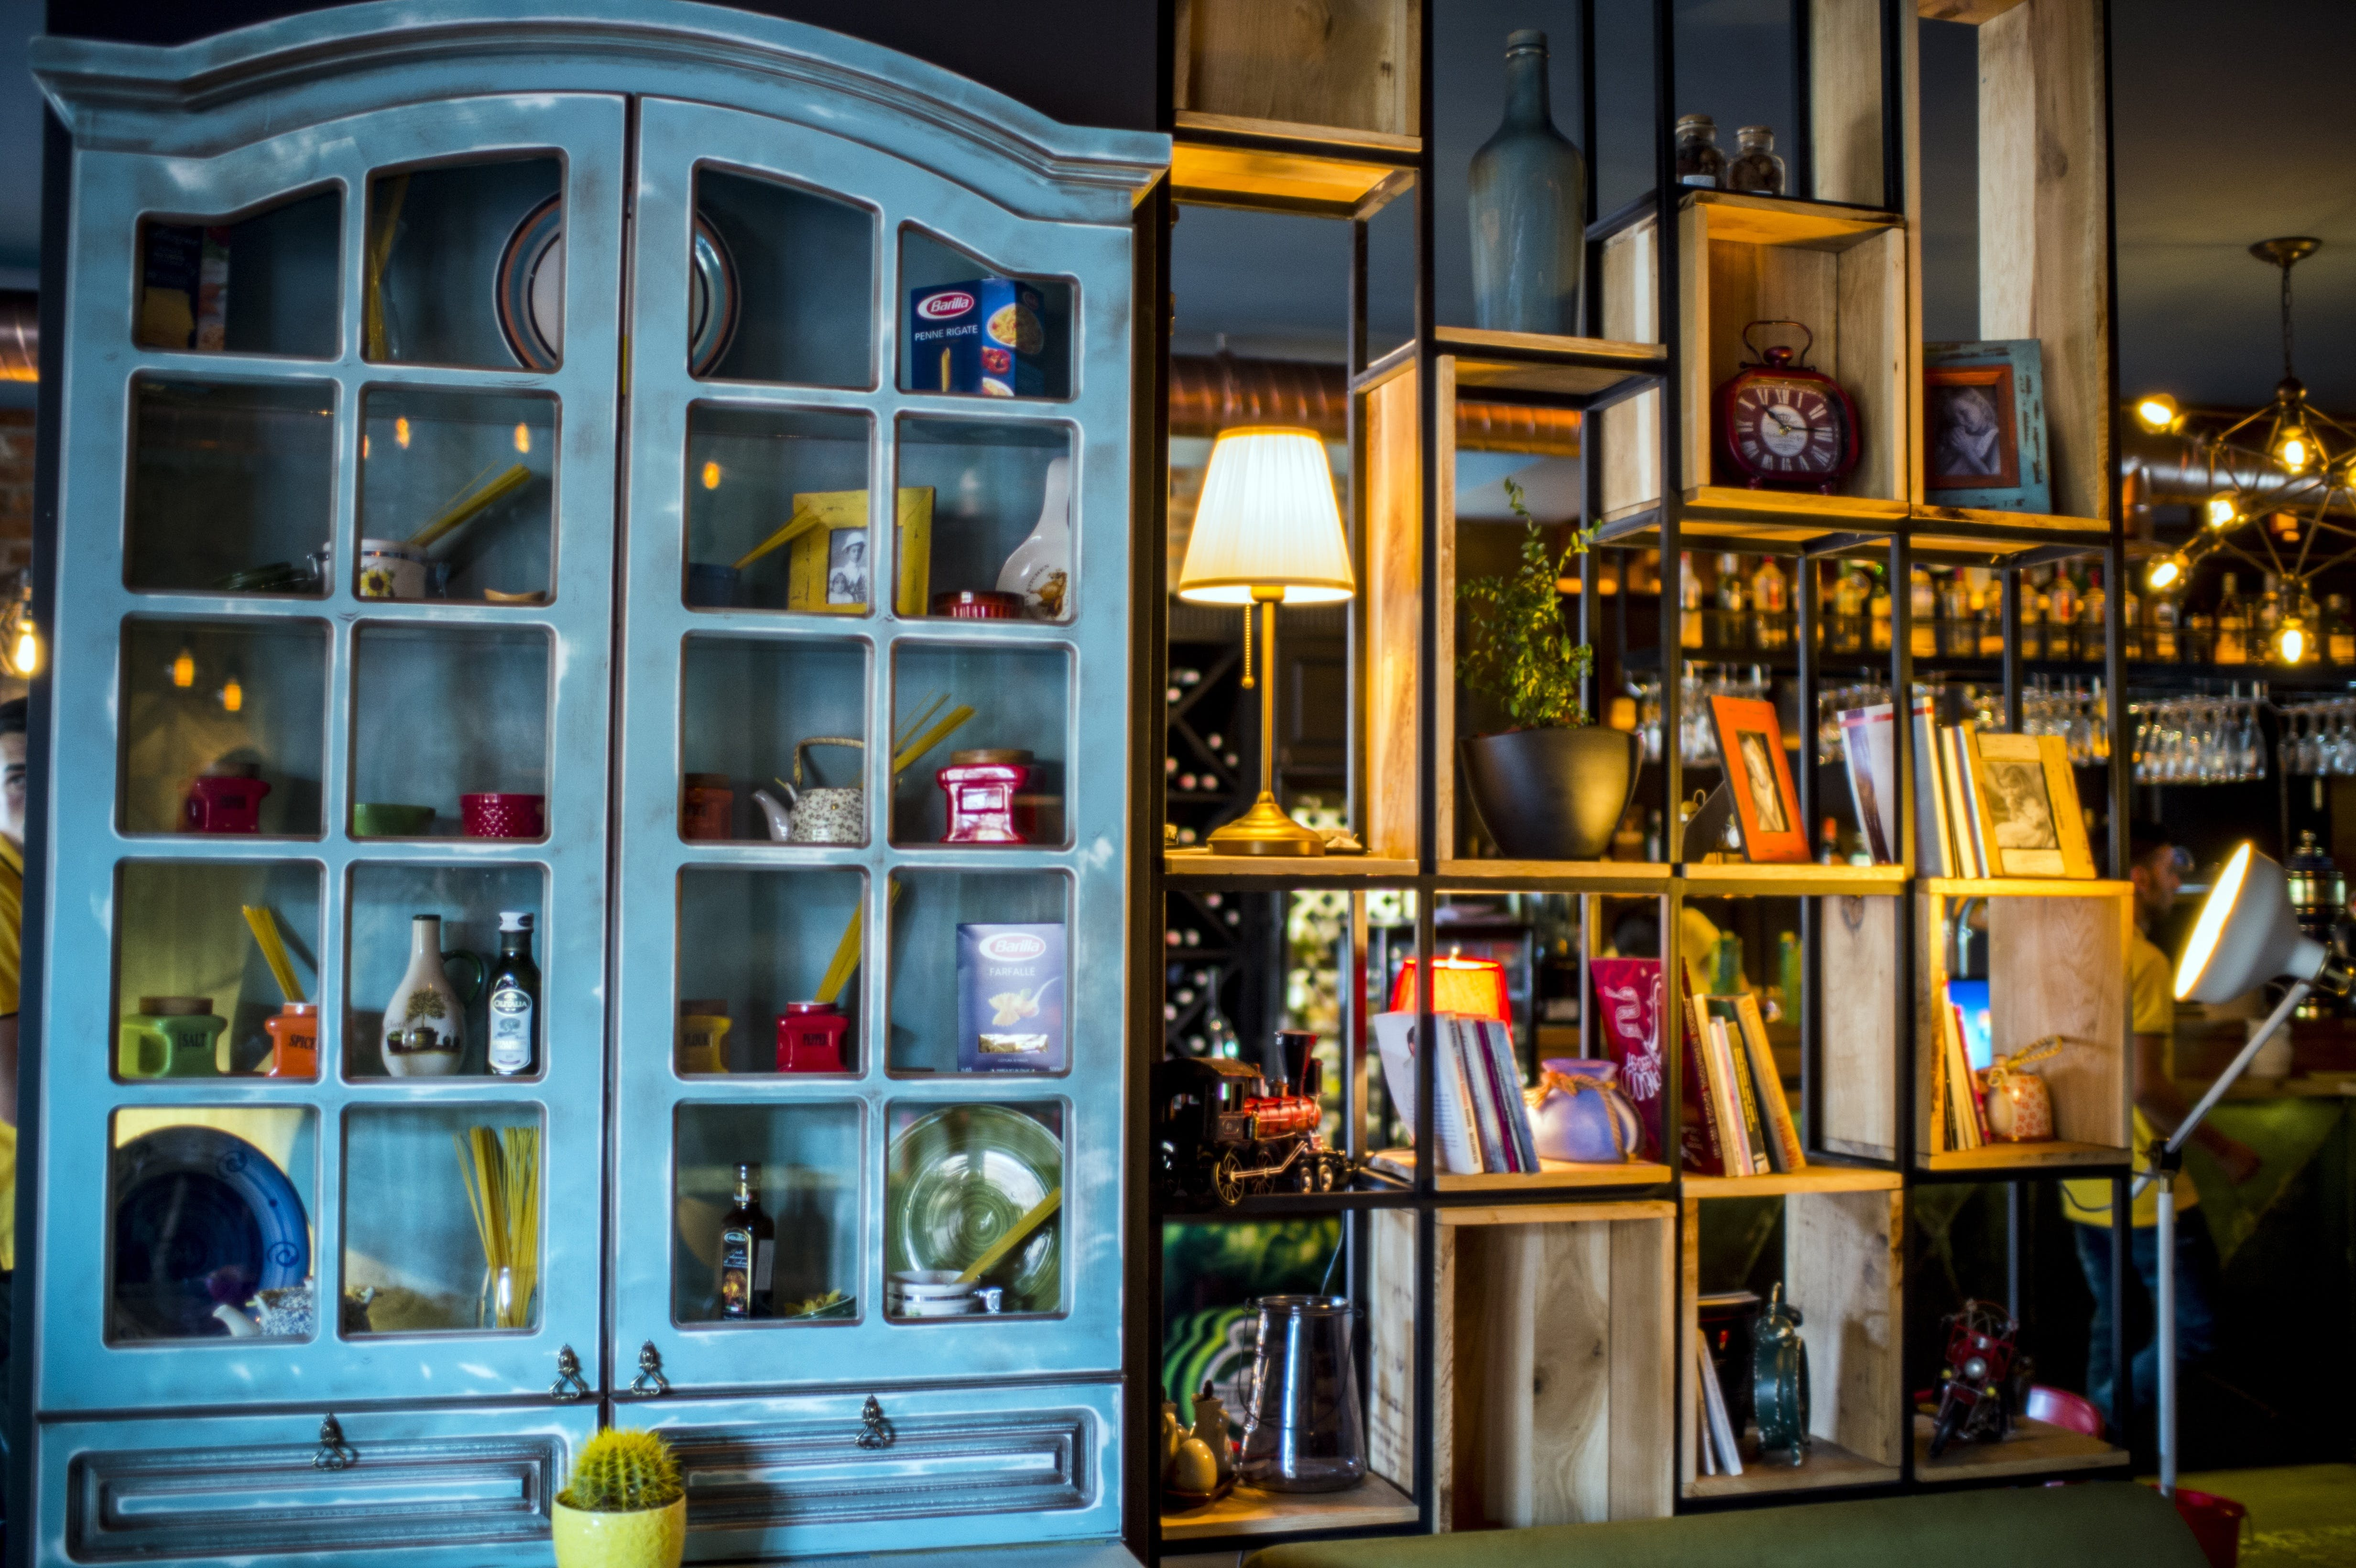 apartment, architecture, bookcase